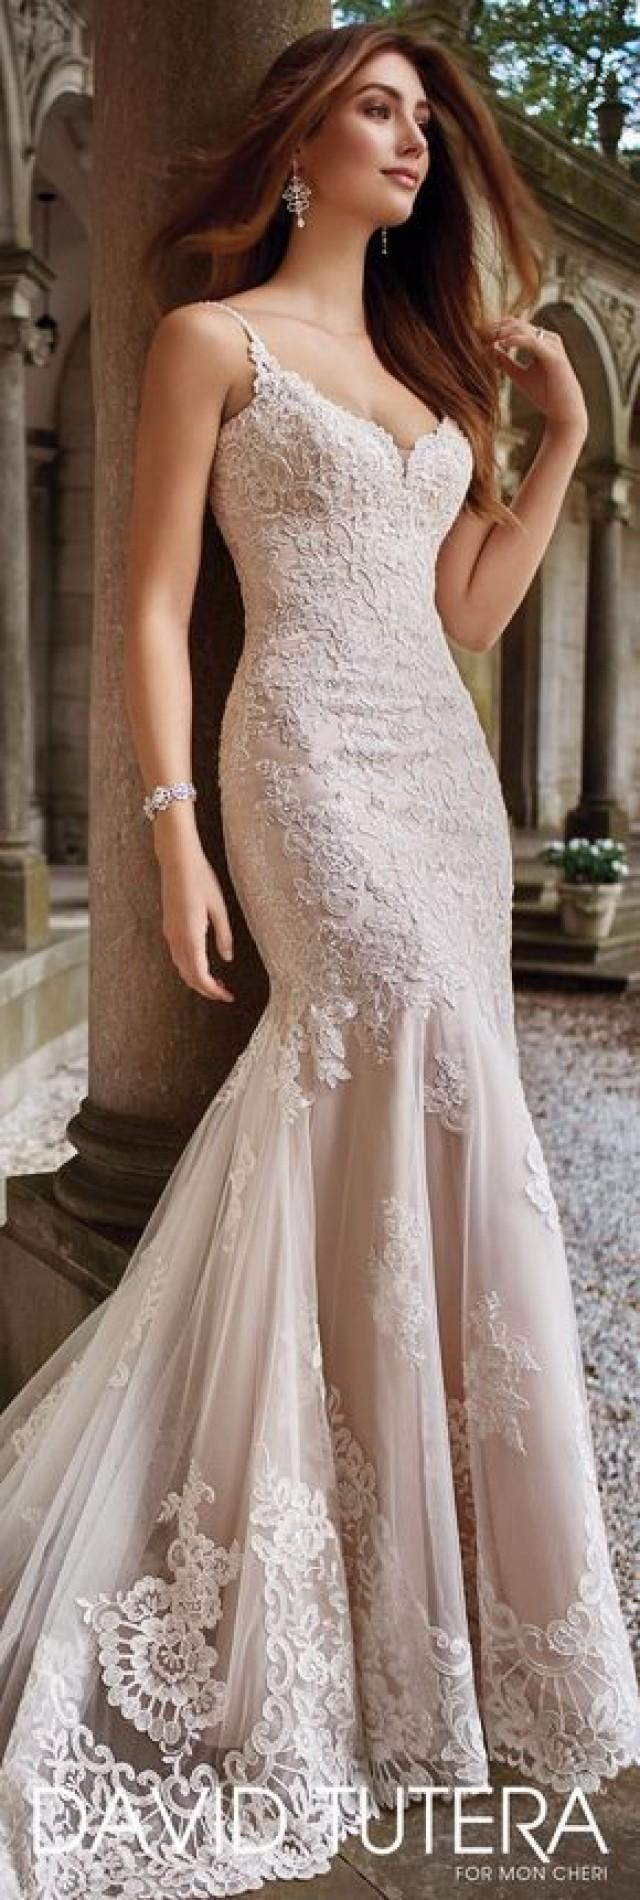 David tutera wedding dresses hand beaded spaghetti strap for Wedding dress trim beading